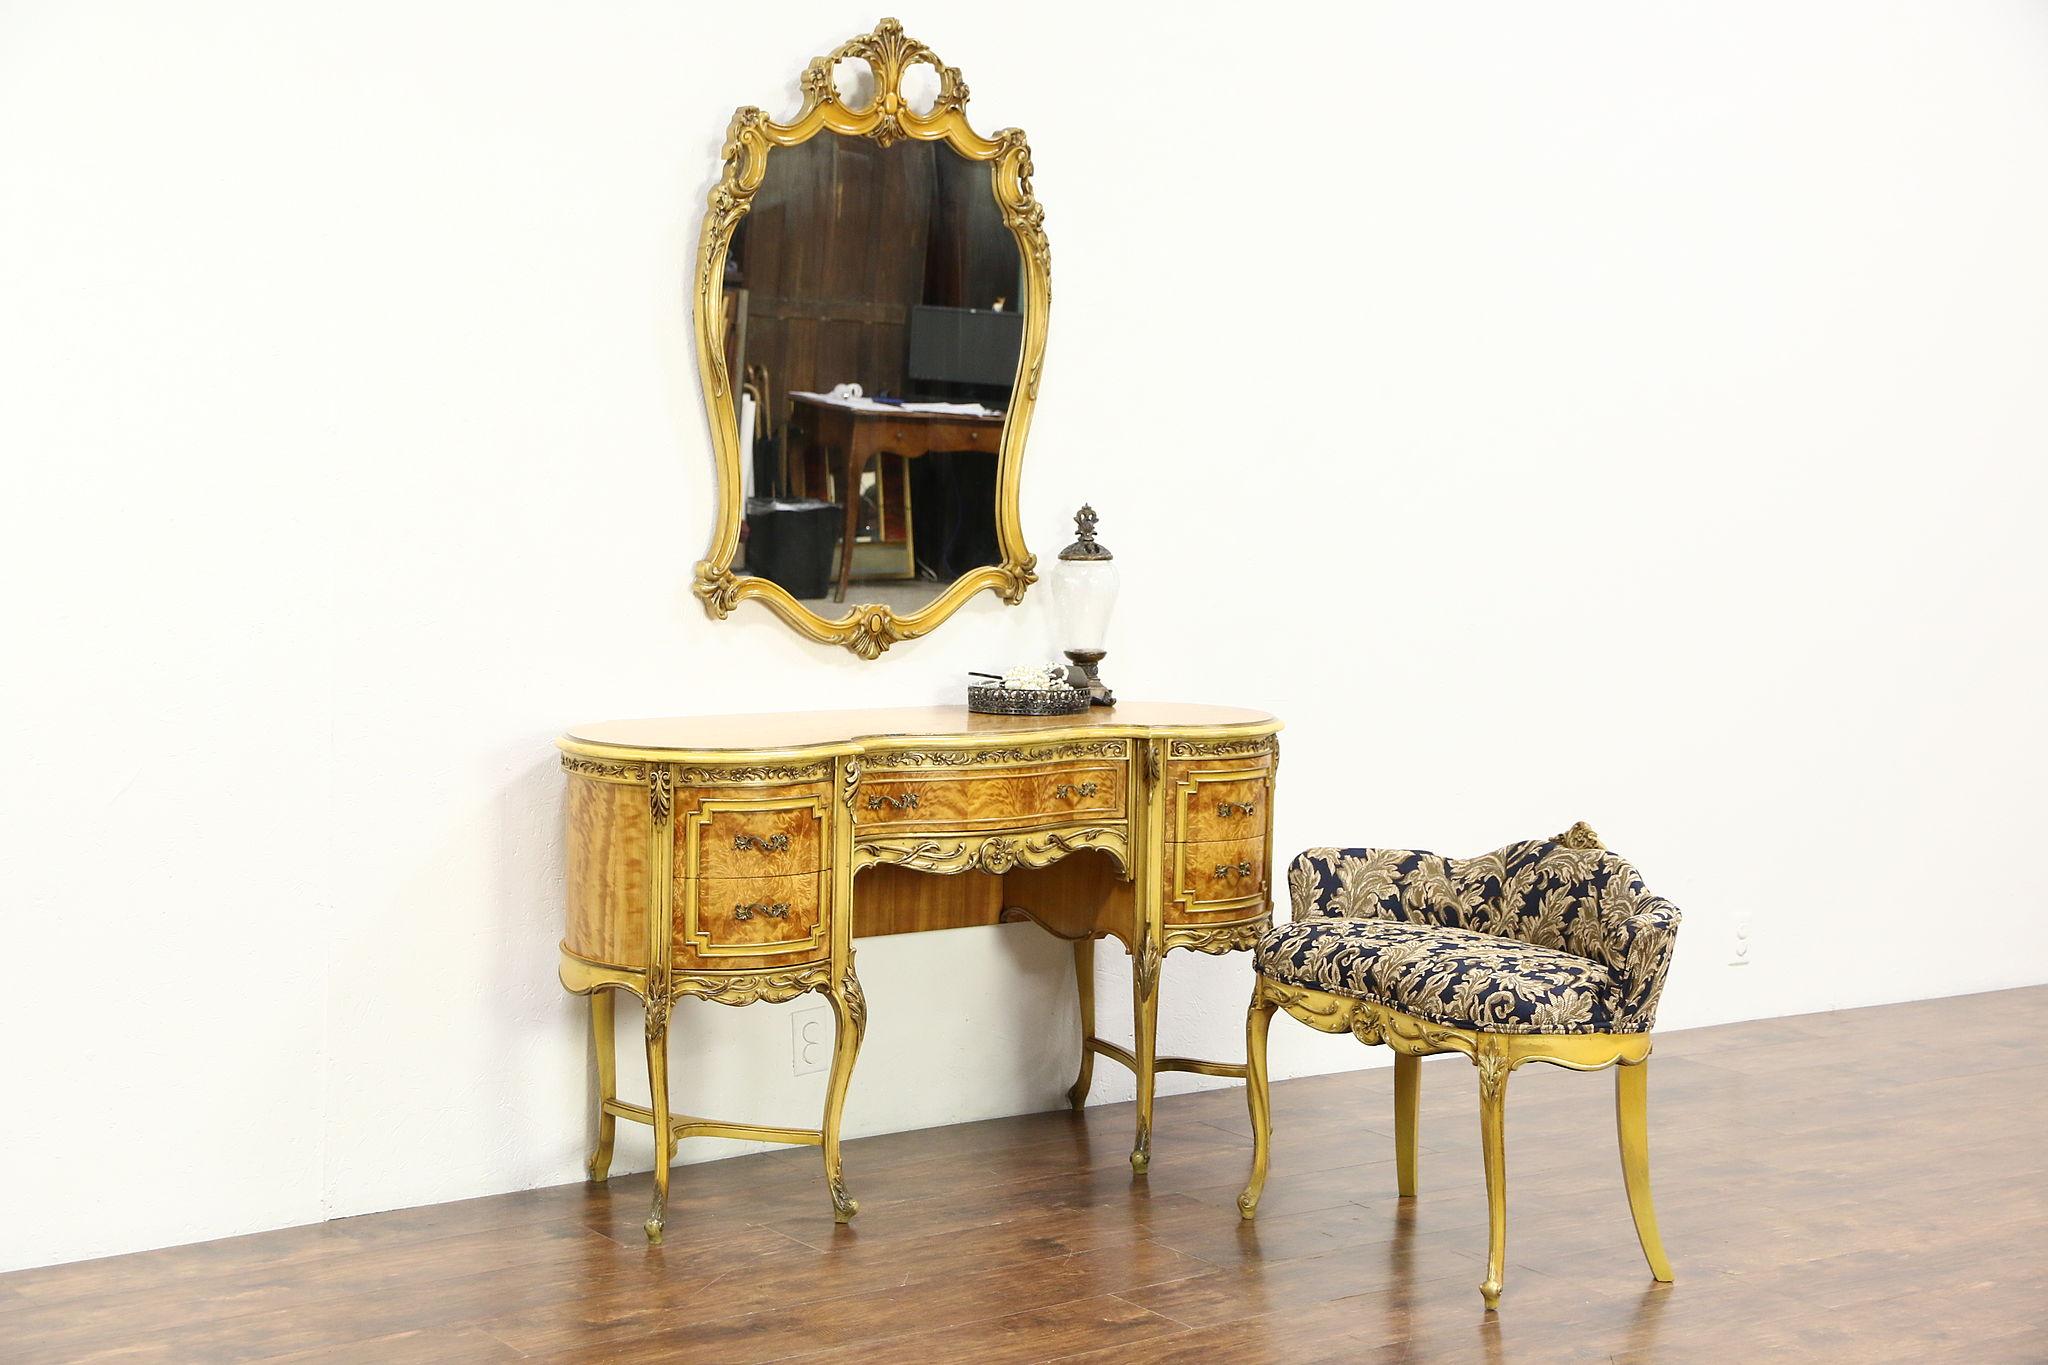 Miraculous Satinwood Hand Painted 1940 Vintage Dressing Table Or Vanity Mirror Bench Ibusinesslaw Wood Chair Design Ideas Ibusinesslaworg